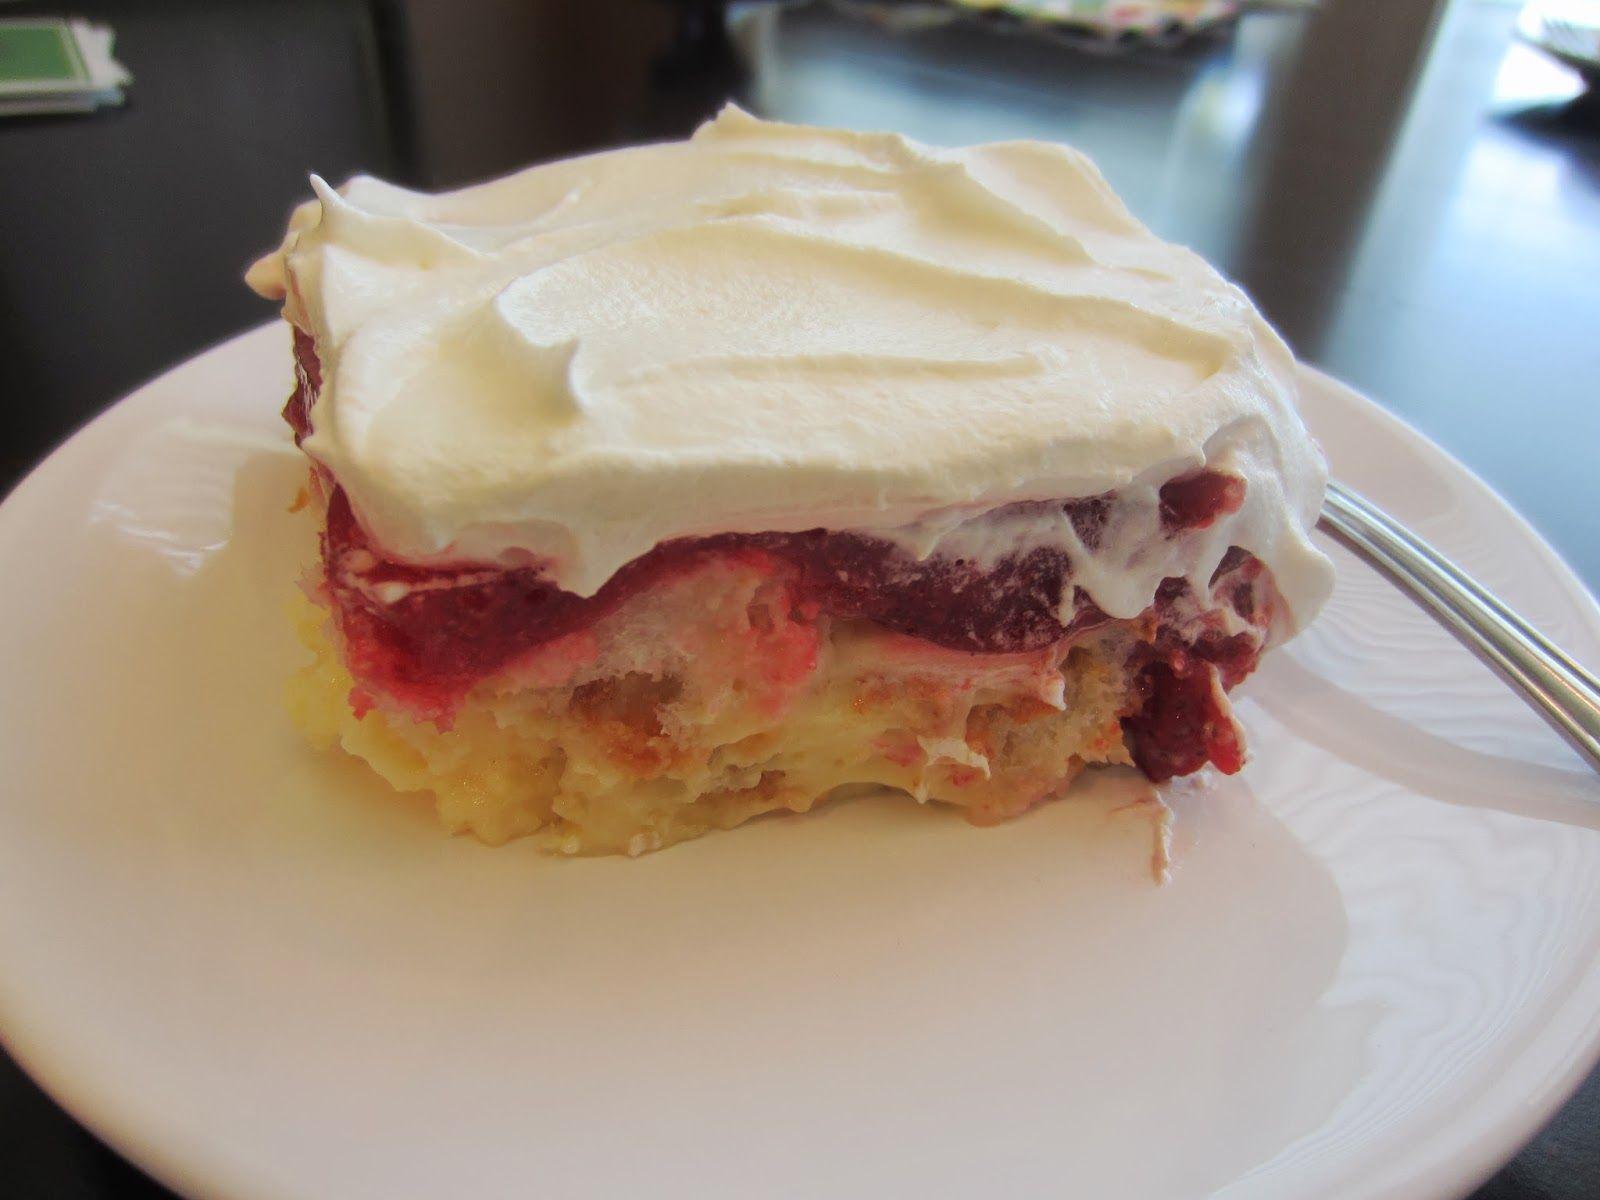 Strawberry Angel Dessert With Images Angel Food Cake Desserts